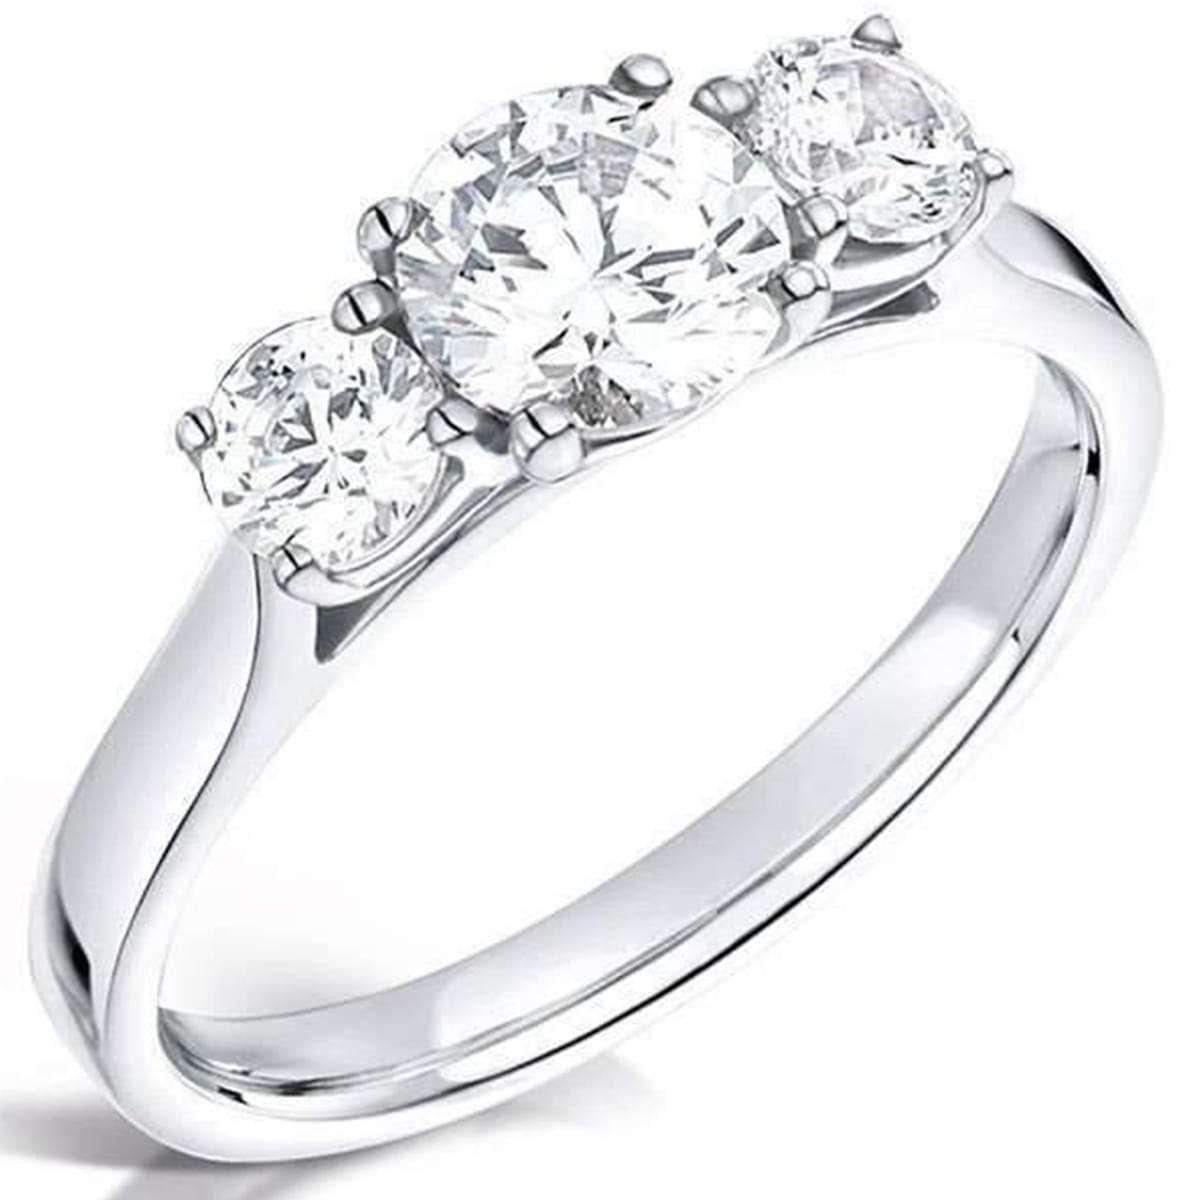 April birthstone - diamond ring